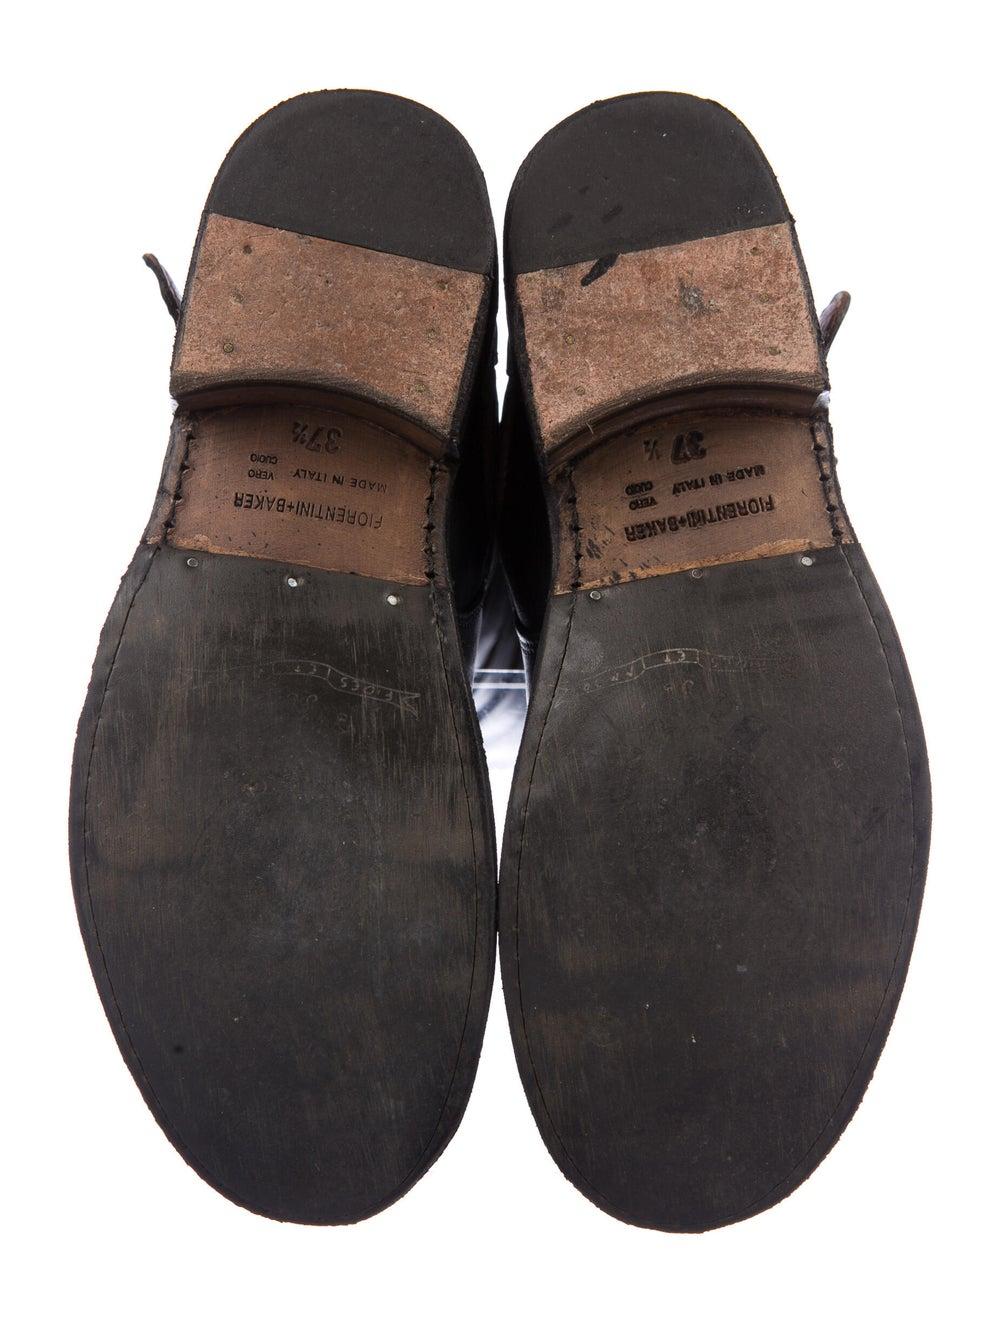 Fiorentini + Baker Leather Combat Boots Black - image 5